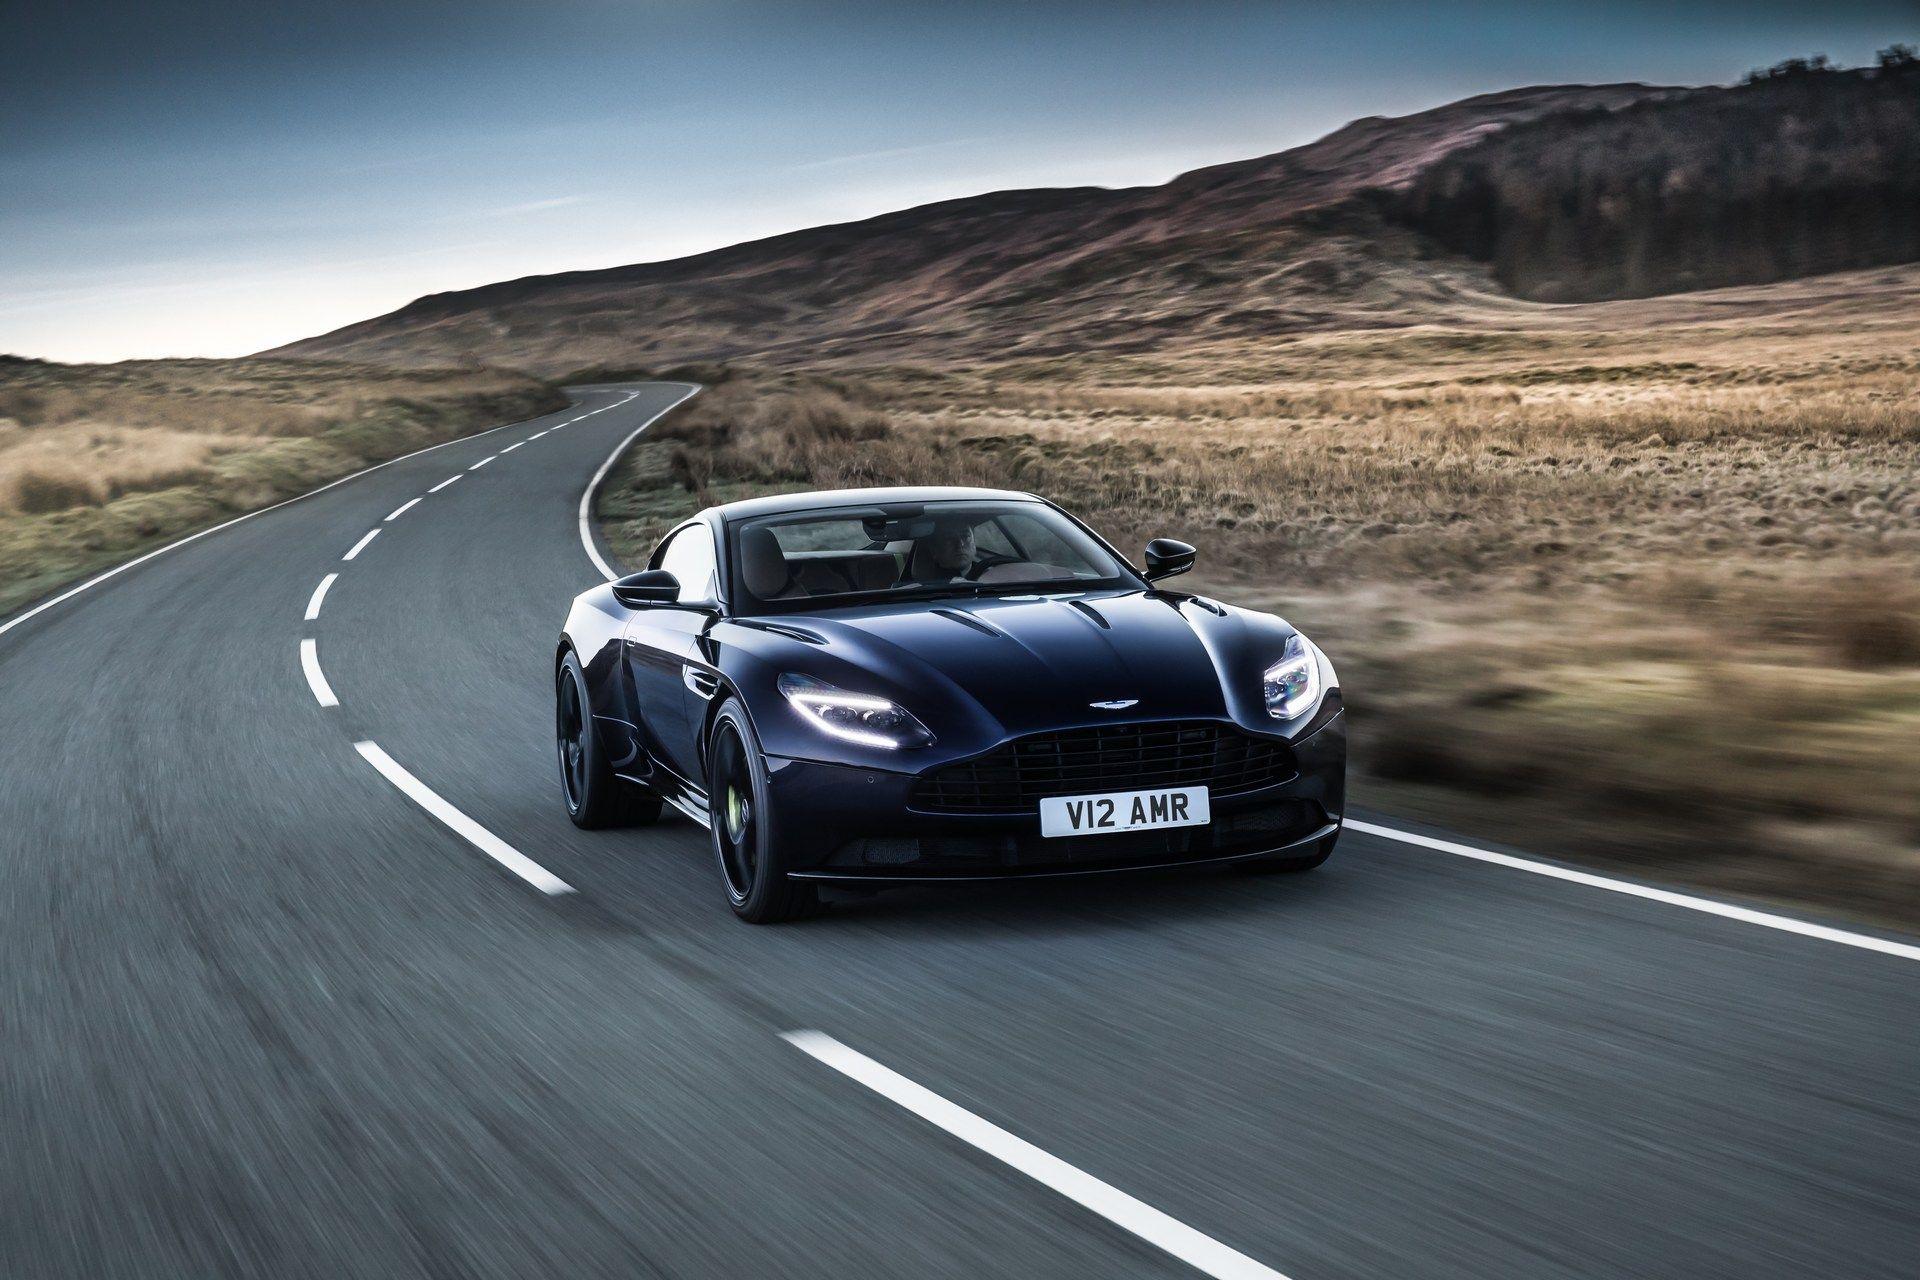 Aston-Martin-DB11-AMR-28